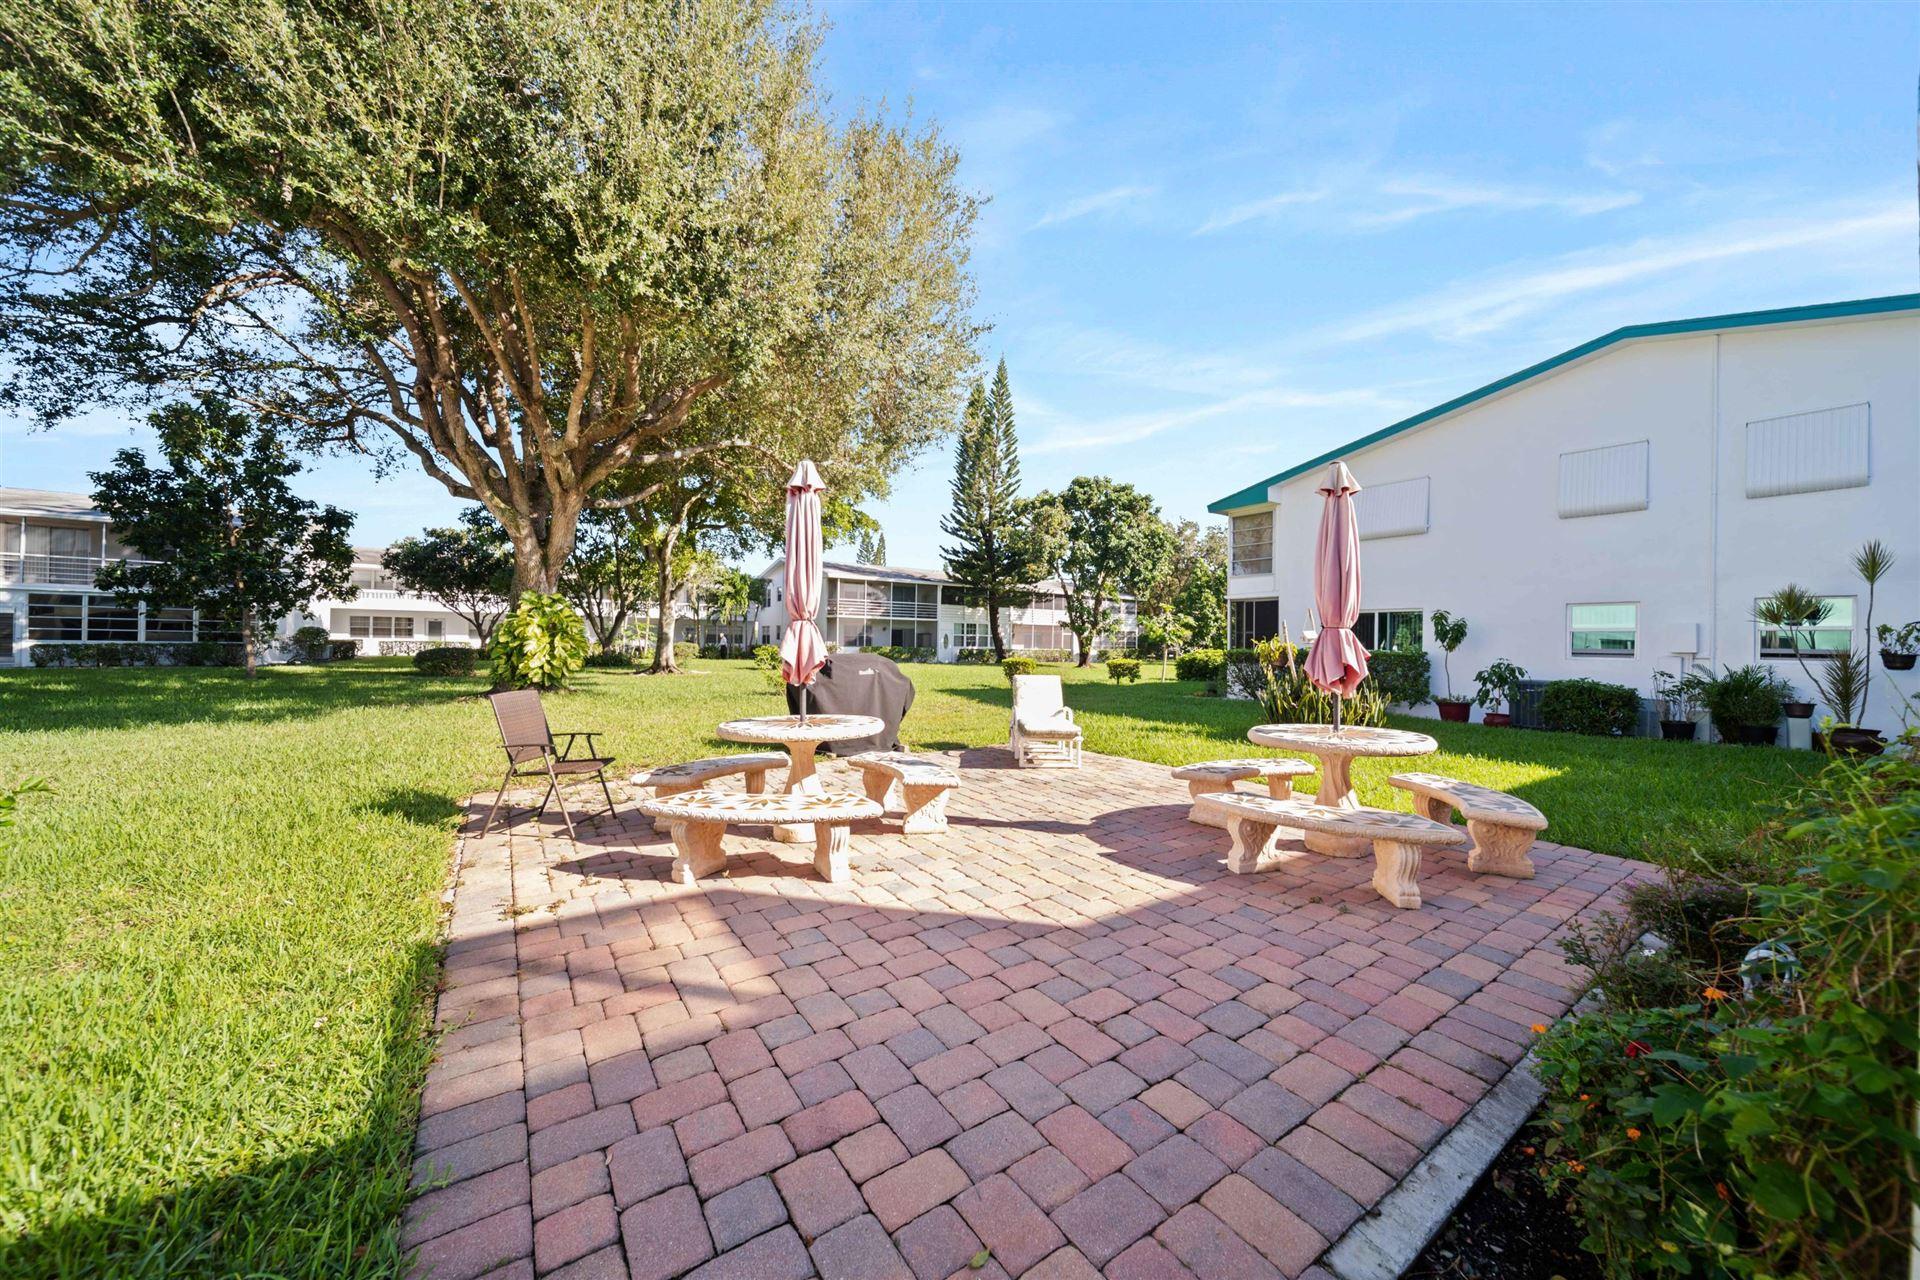 256 Sussex M, West Palm Beach, FL 33417 - #: RX-10673015